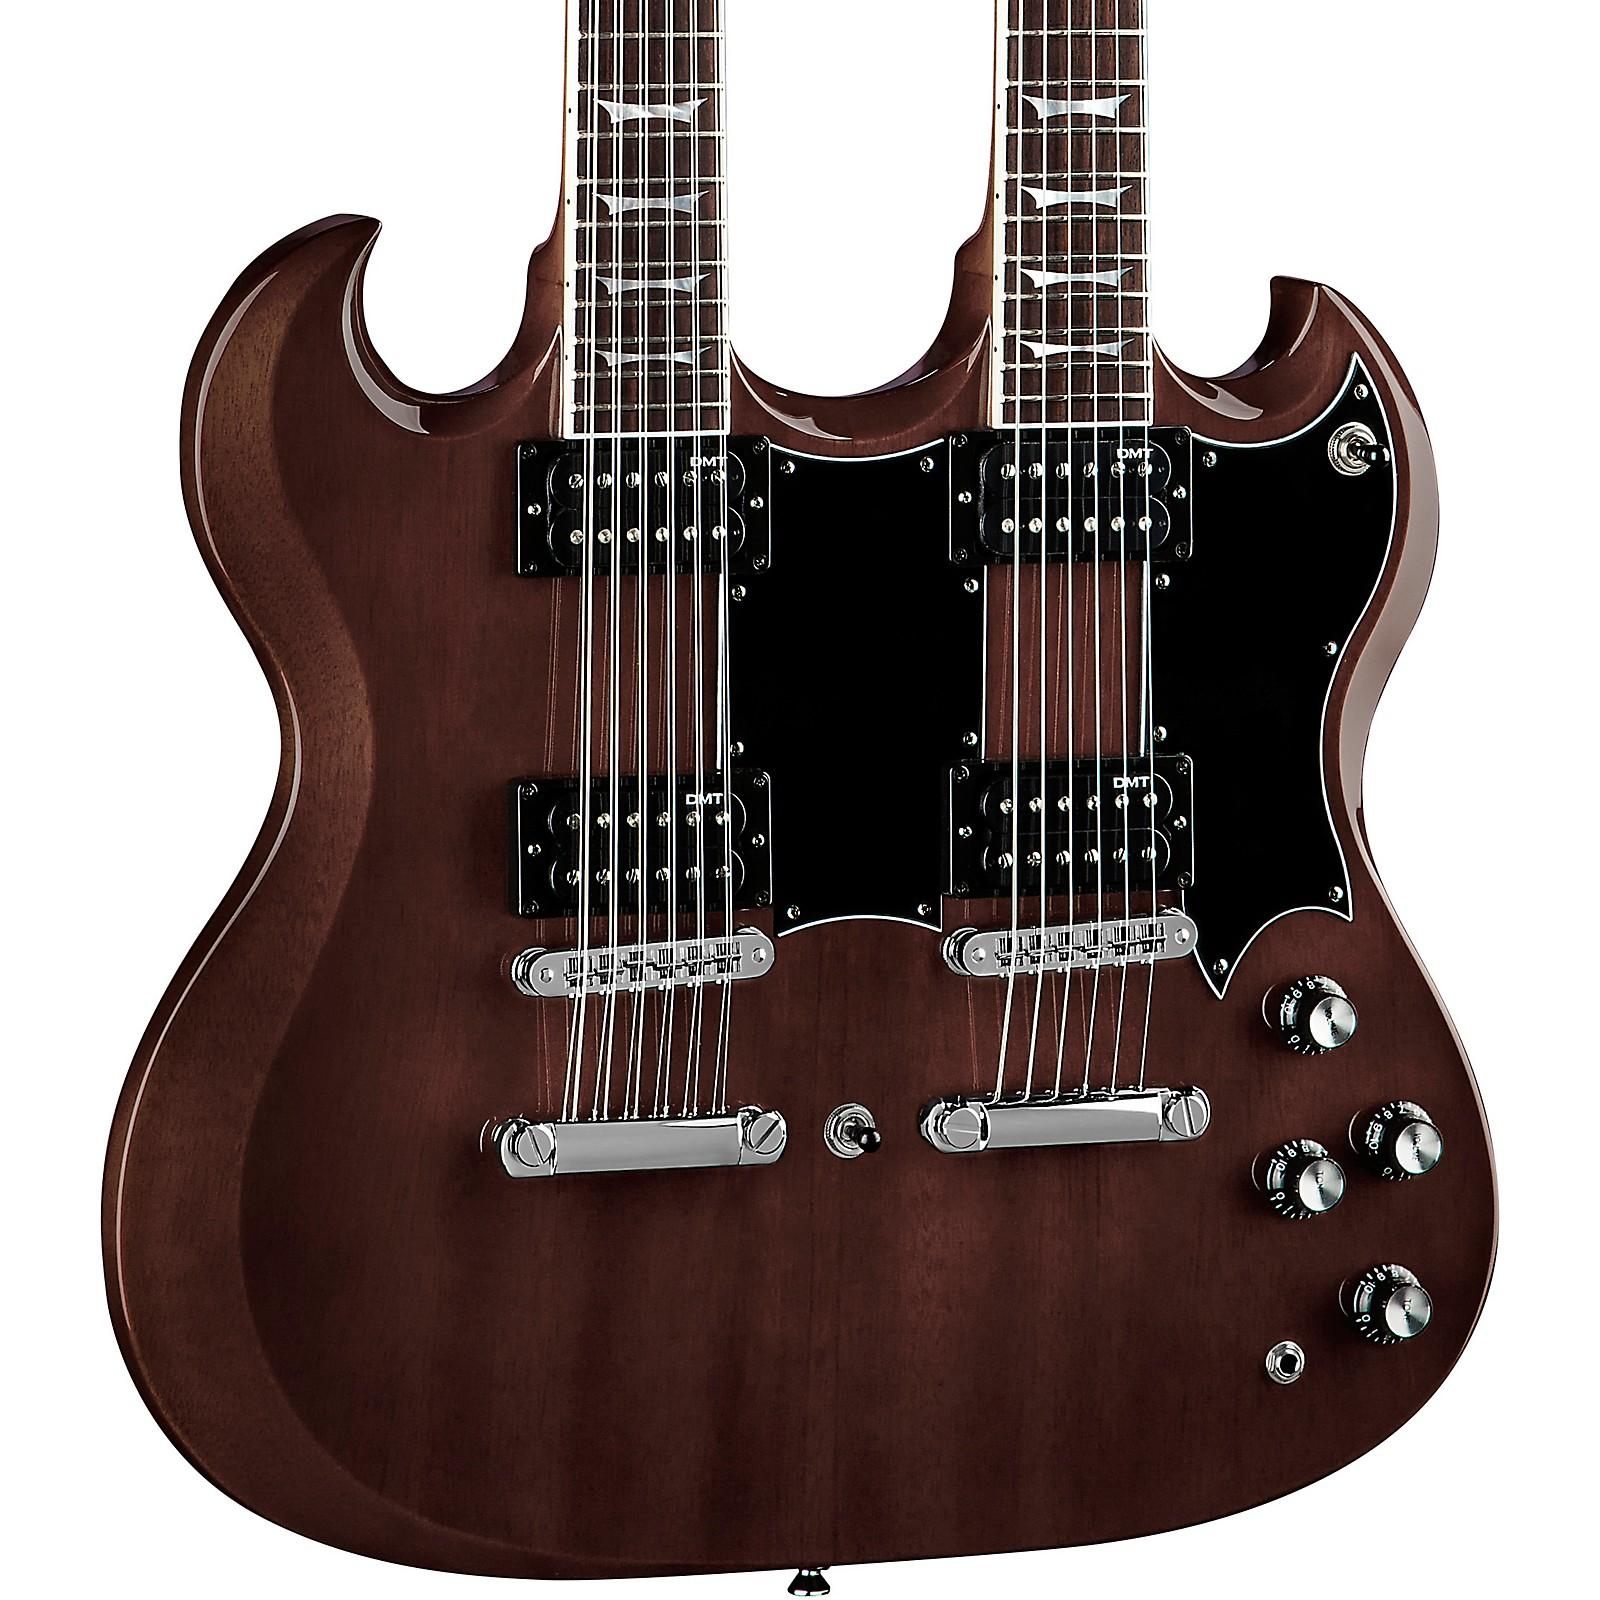 Dean Gran Sport Double Neck Worn Brown Electric Guitar